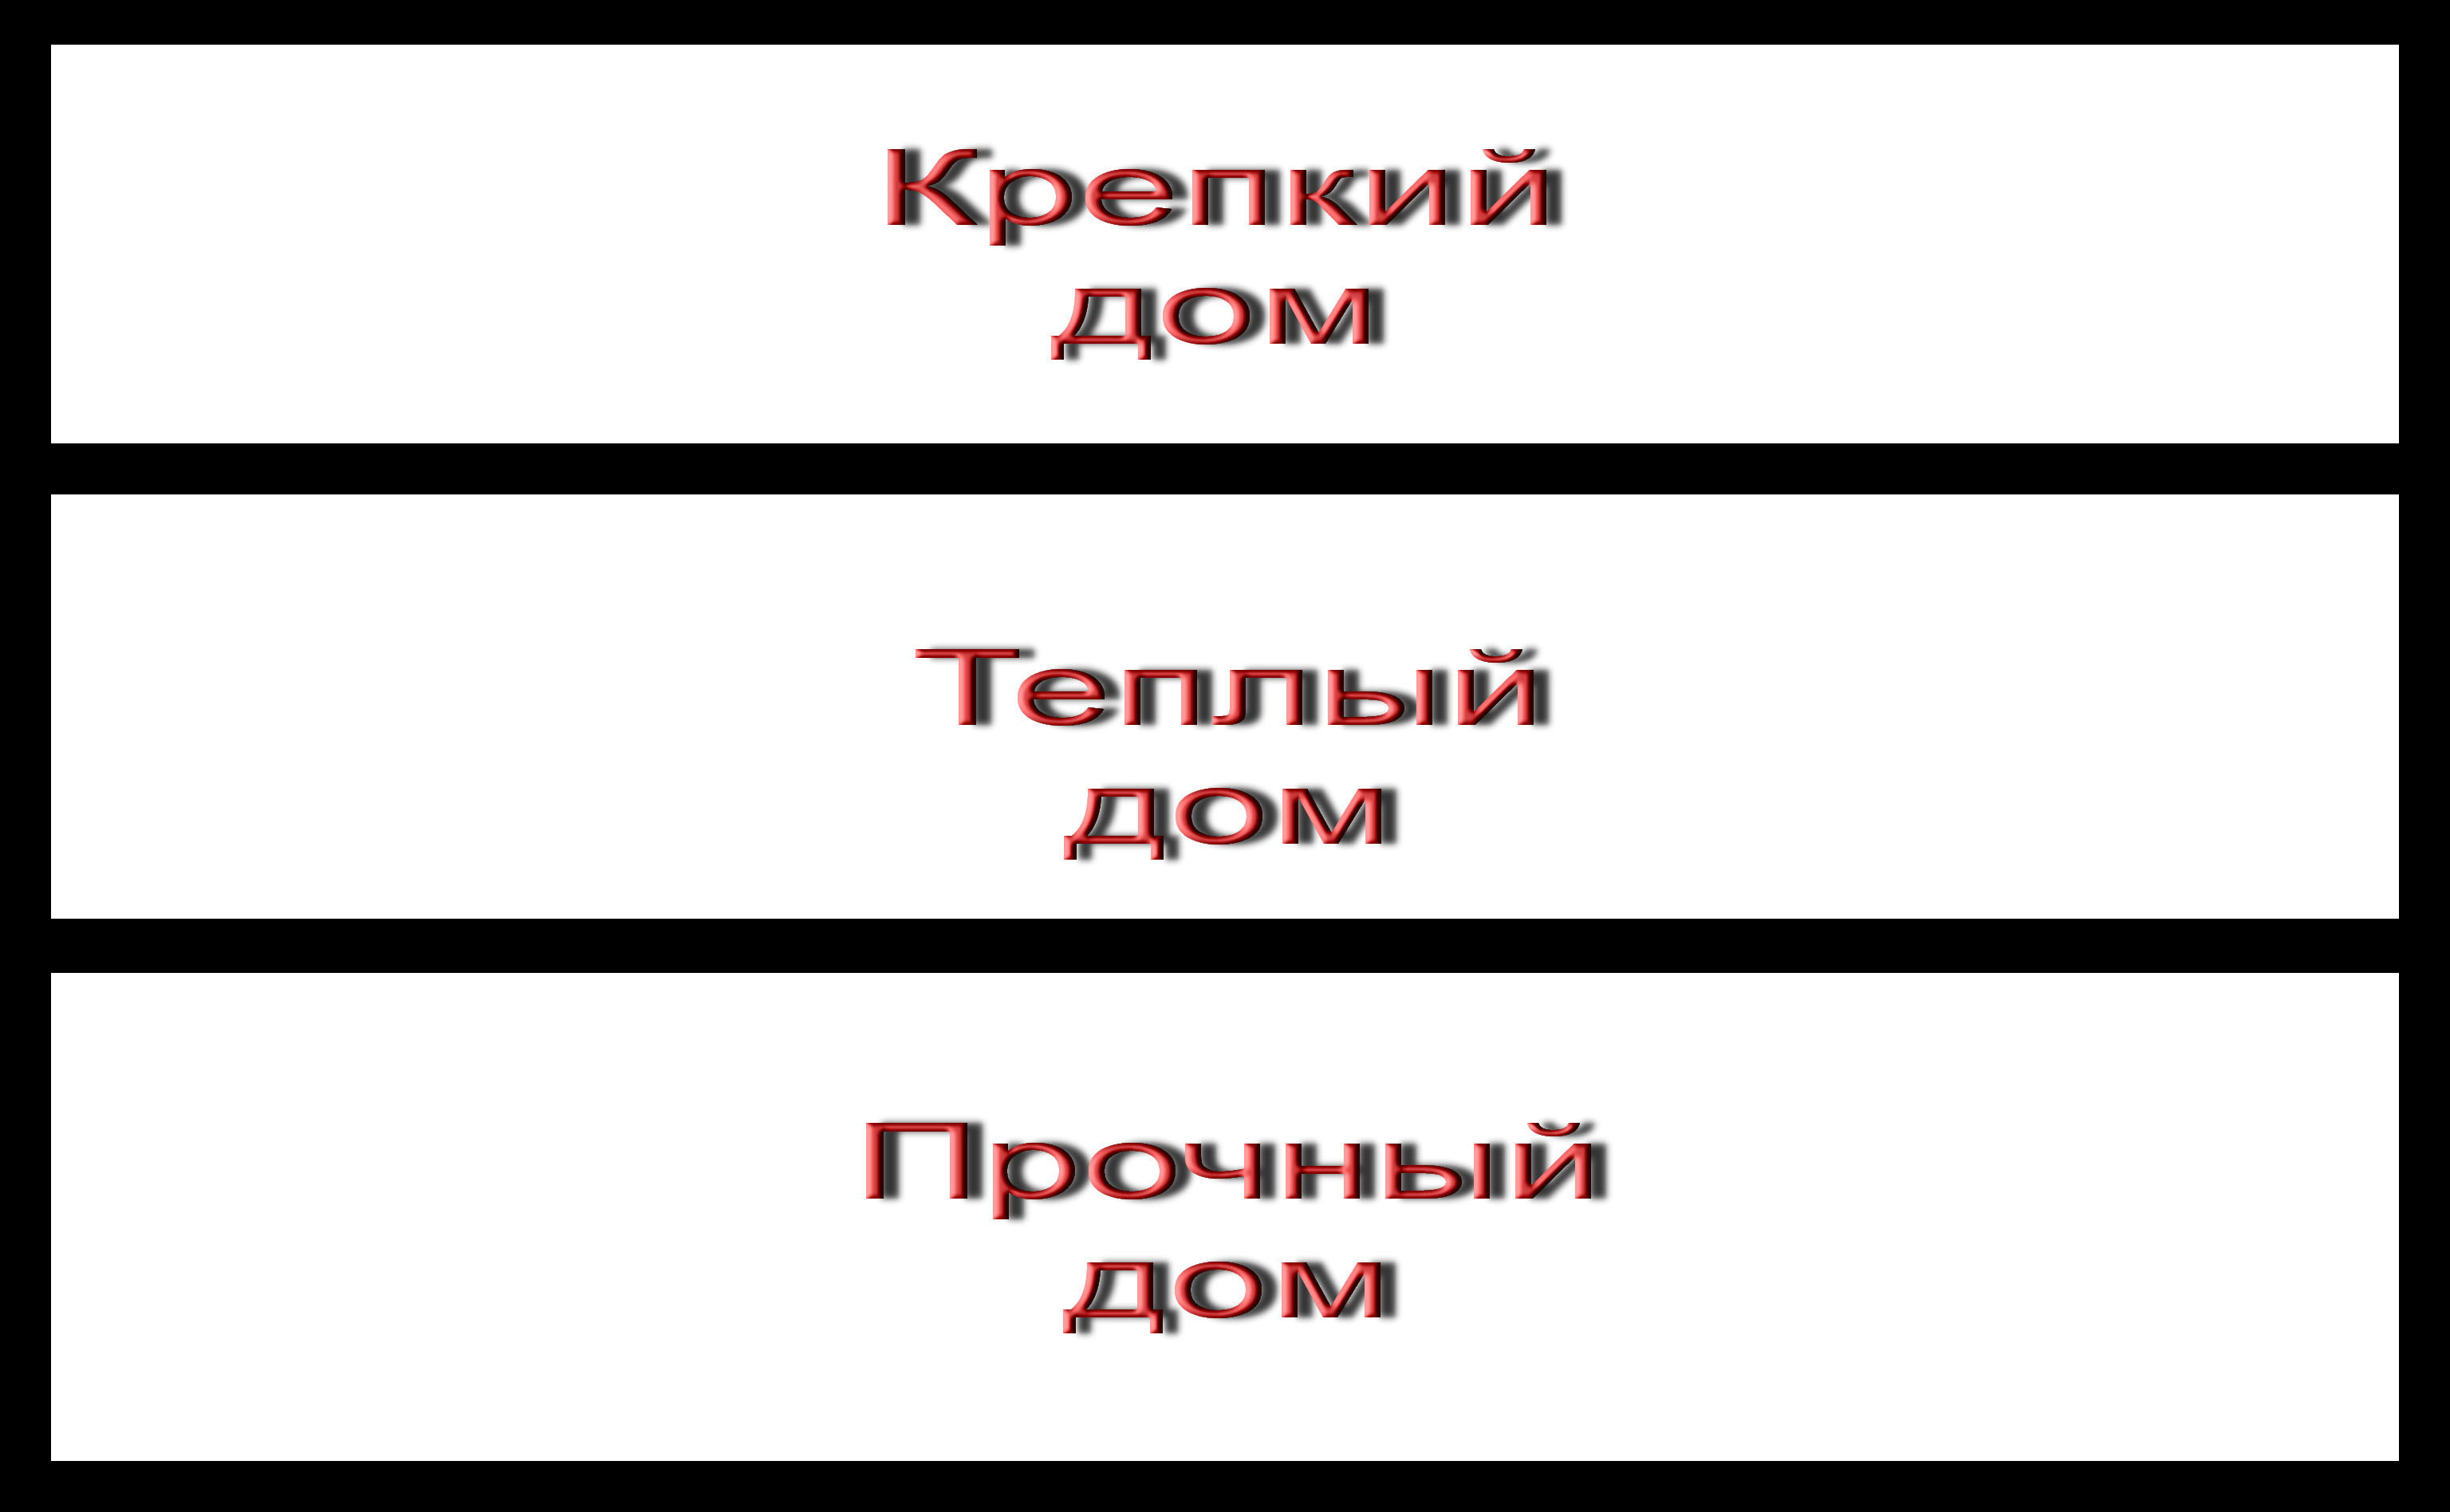 Название торговой марки для завода (производителя паркета) фото f_0595a2d547a29c6f.jpg